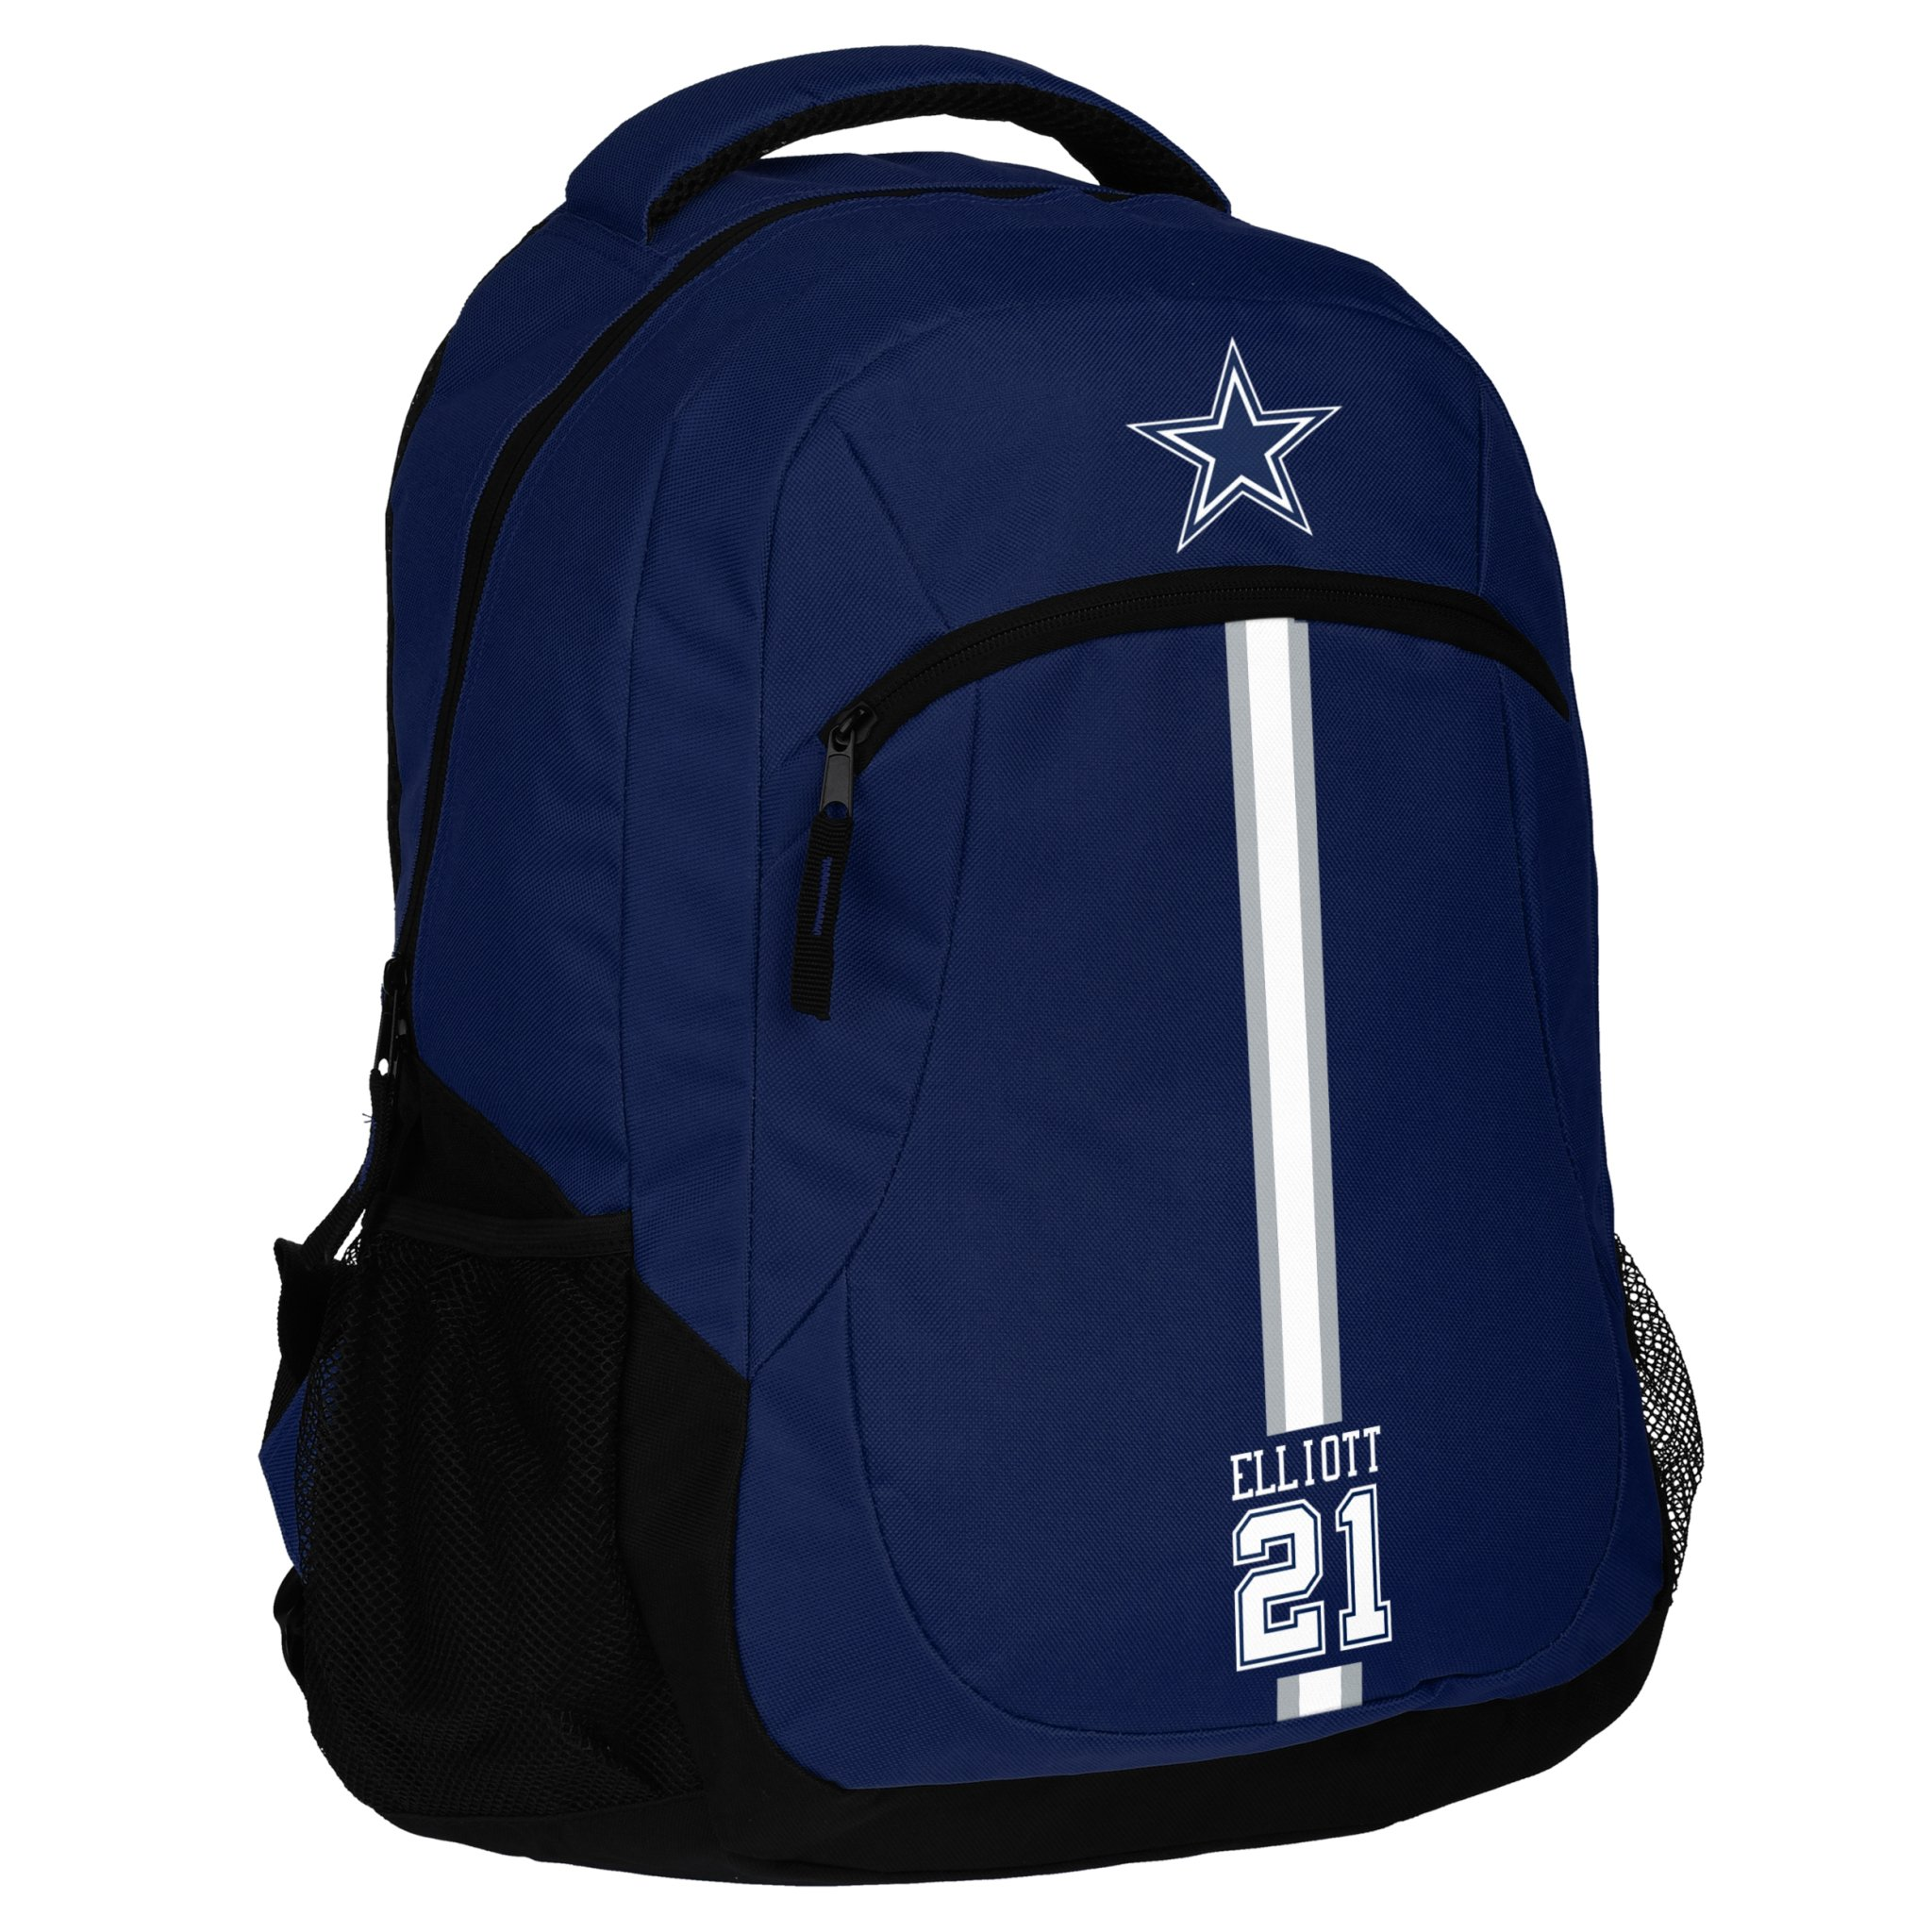 FOCO Dallas Cowboys Action Backpack School Gym Bag - Ezekiel Elliott #21 by FOCO